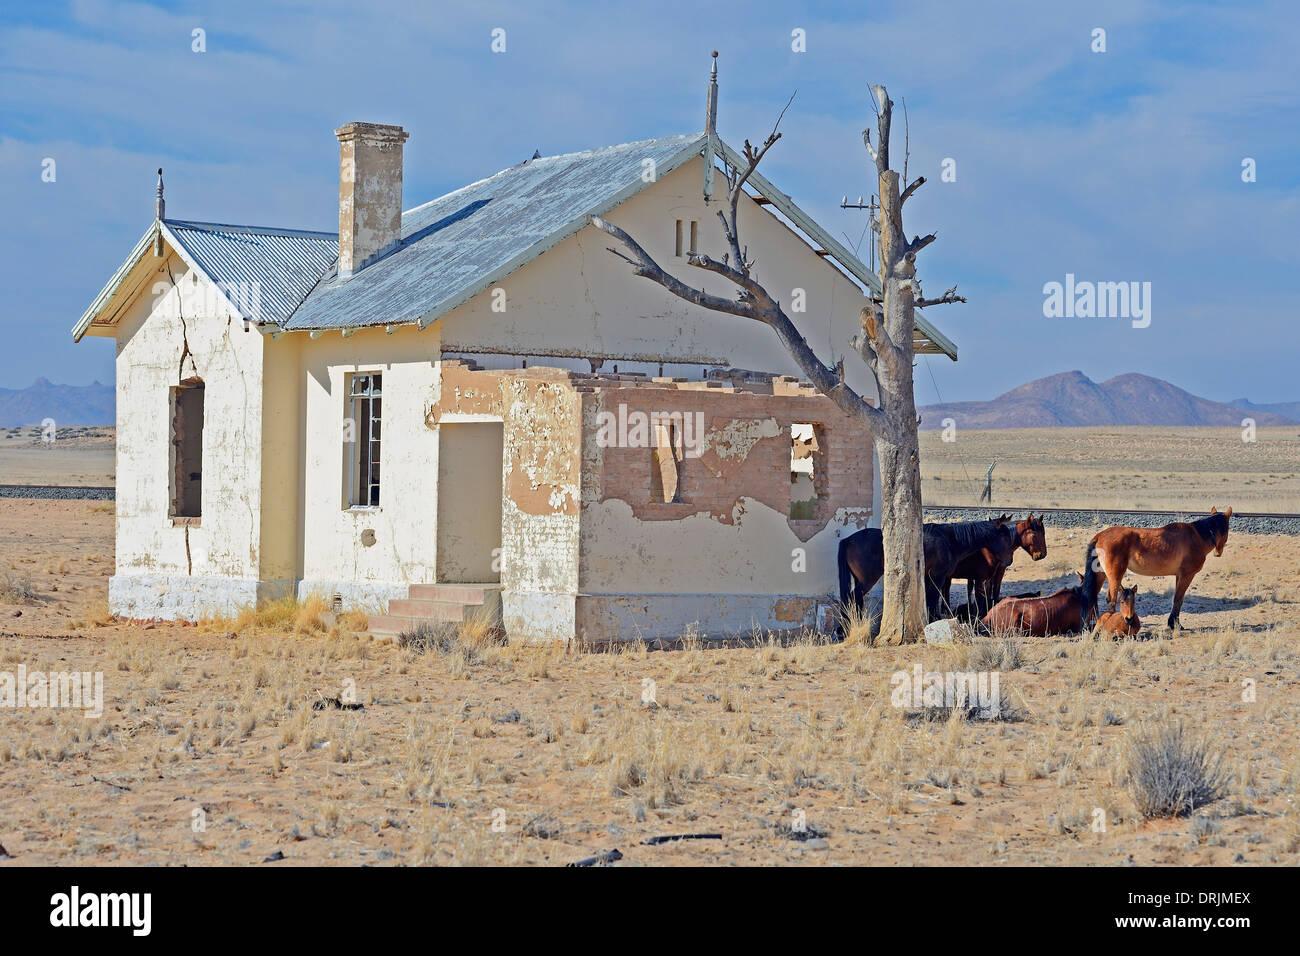 Wild horses to dilapidated road court building of Garub with From, Namibia, Africa, Wildpferde an verfallenen Bahnshofsgebaeude Stock Photo